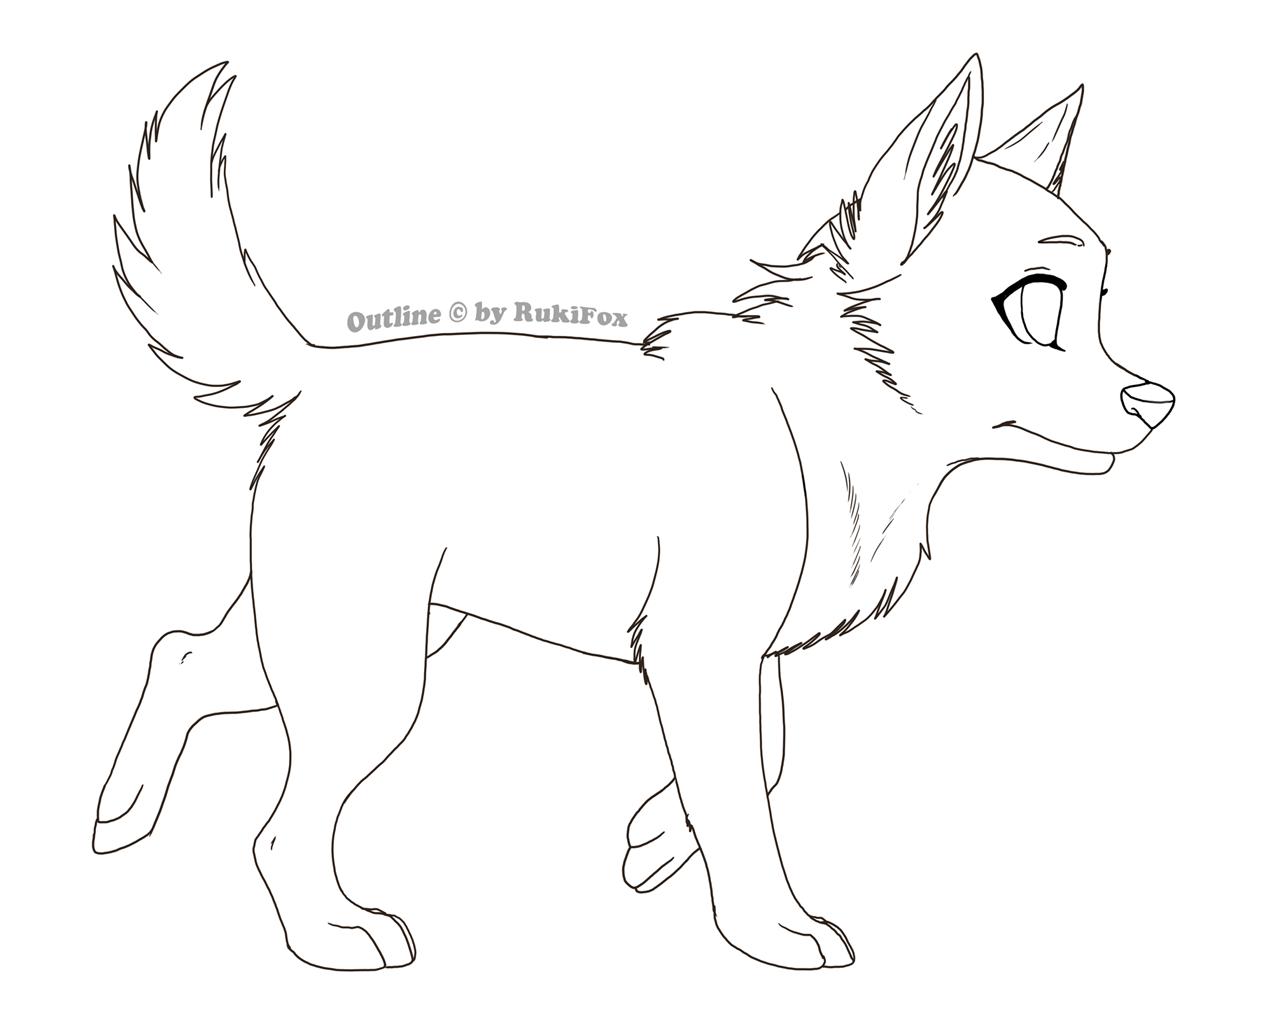 Puppy outline03 by RukiFox on DeviantArt